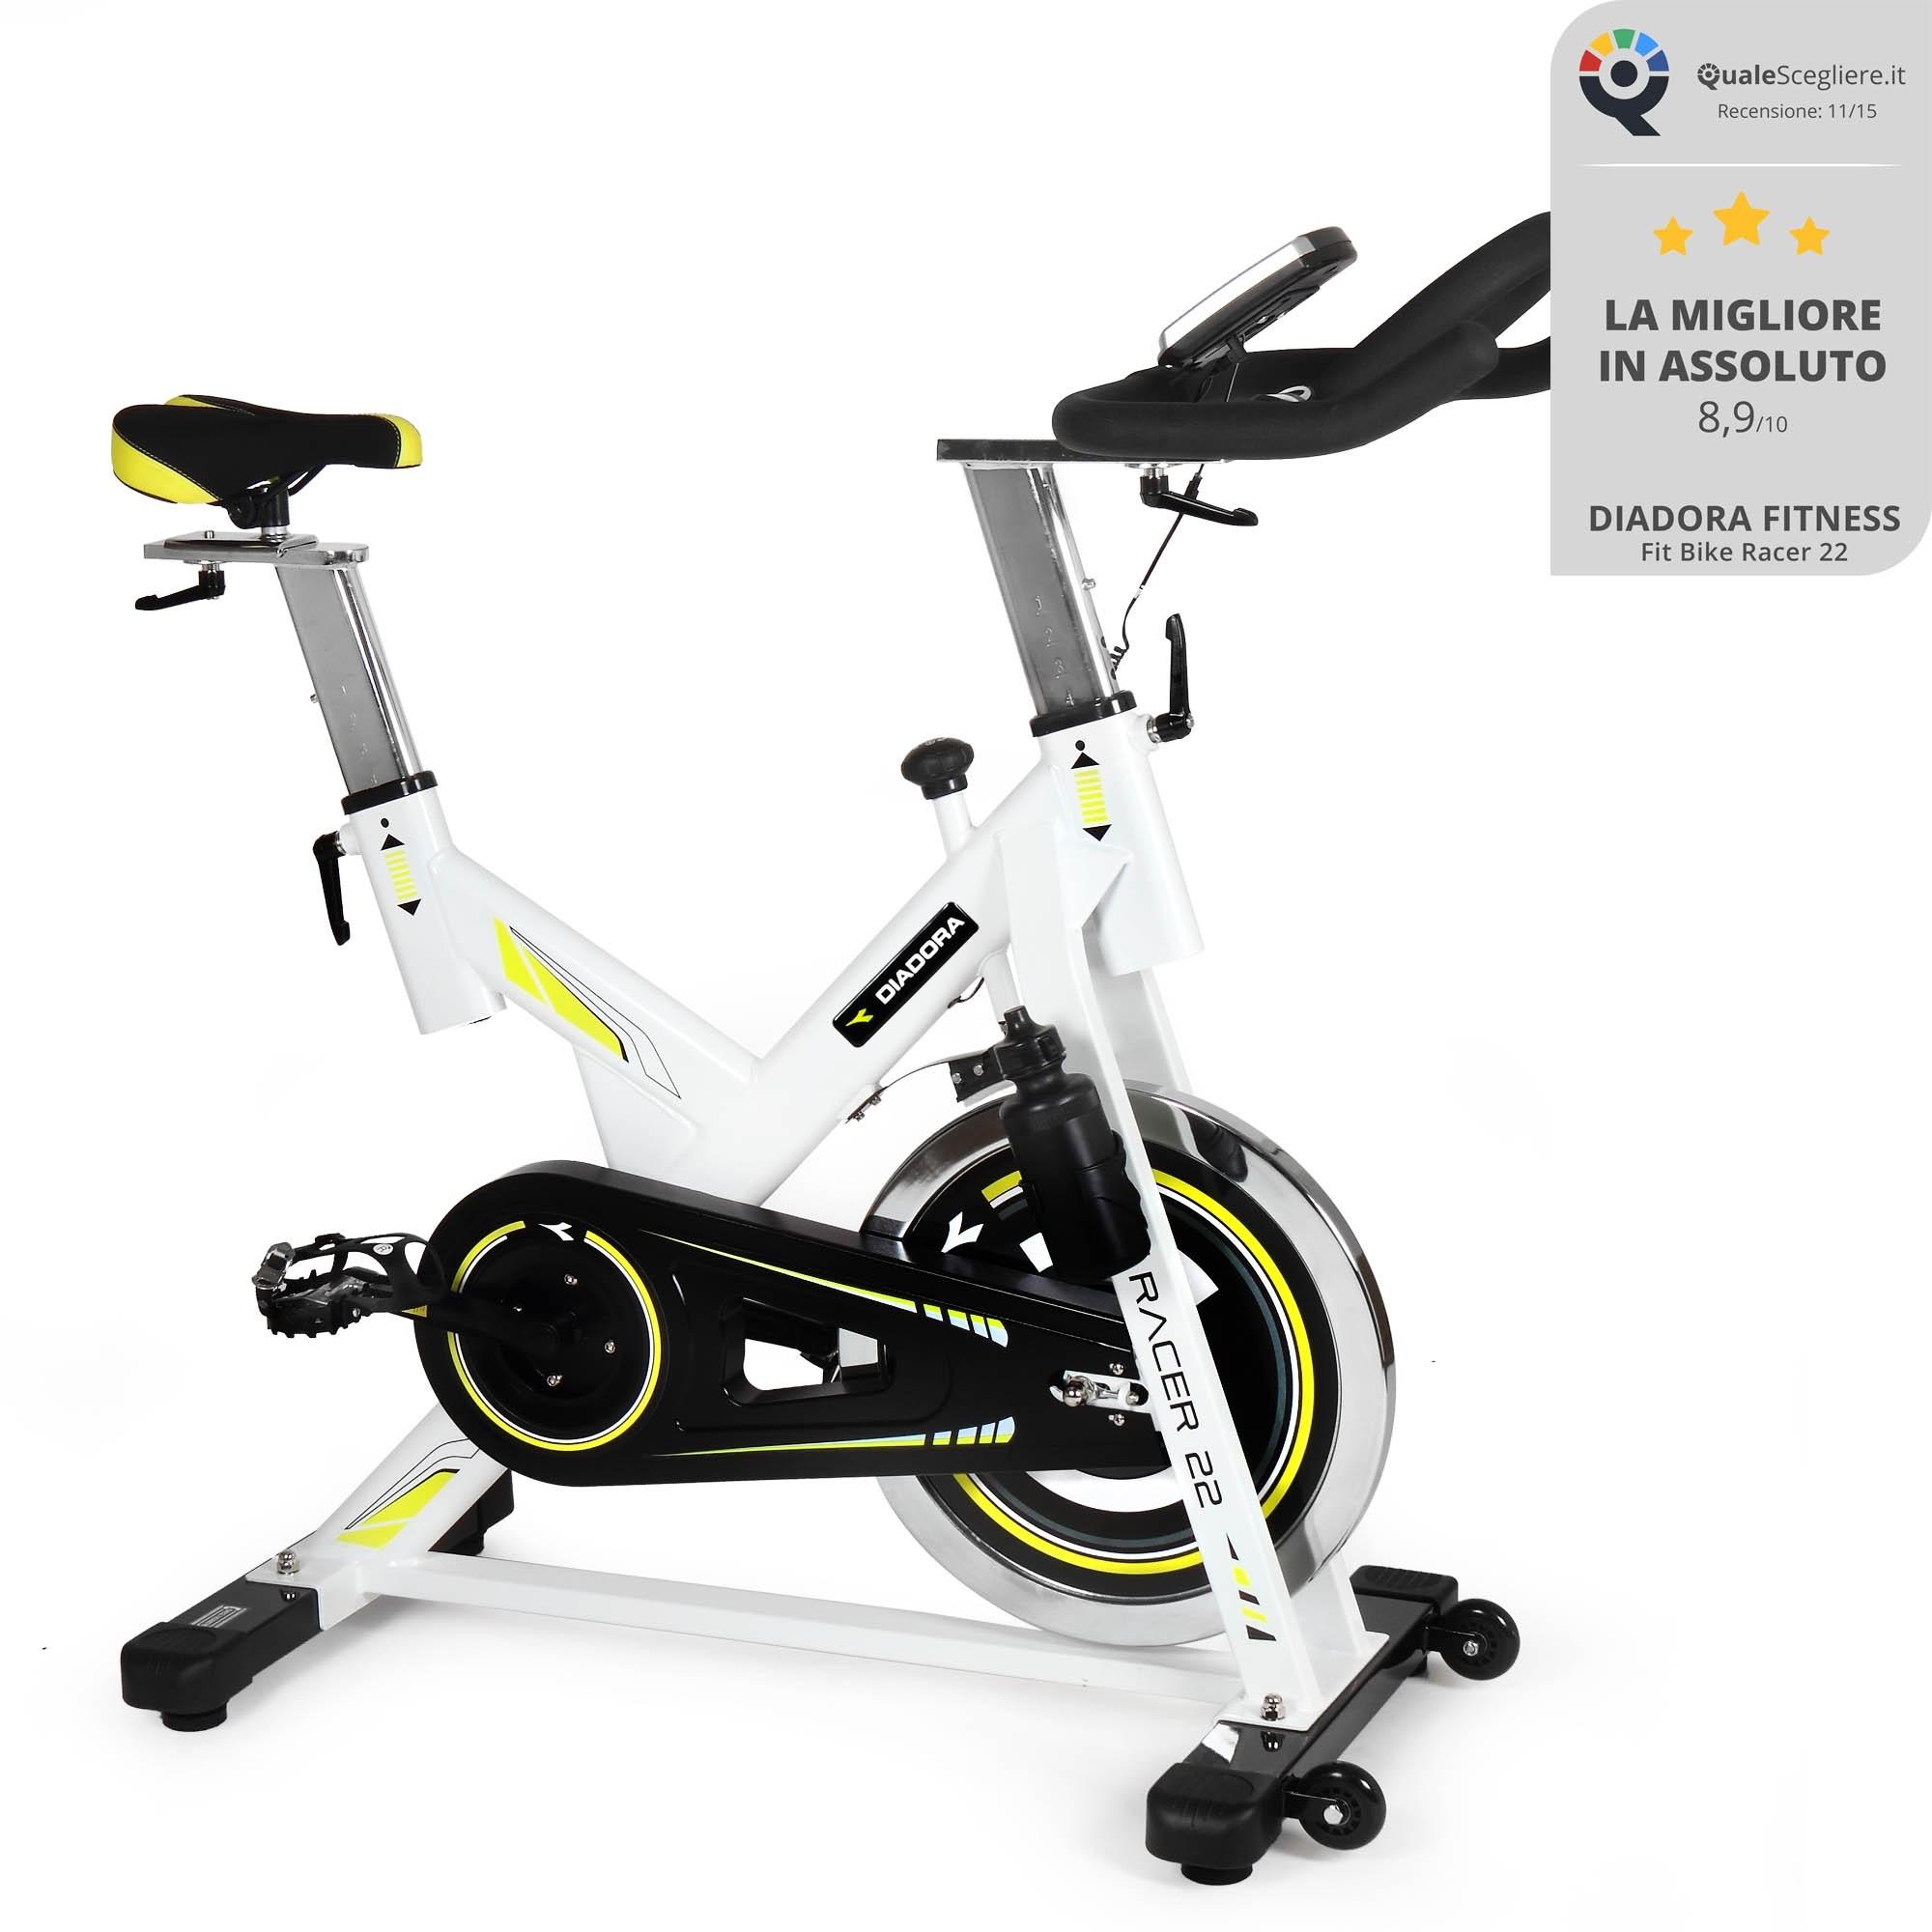 bd678013e5bfc Fit bike Diadora Racer 22 C - Fit bike - Diadora Fitness